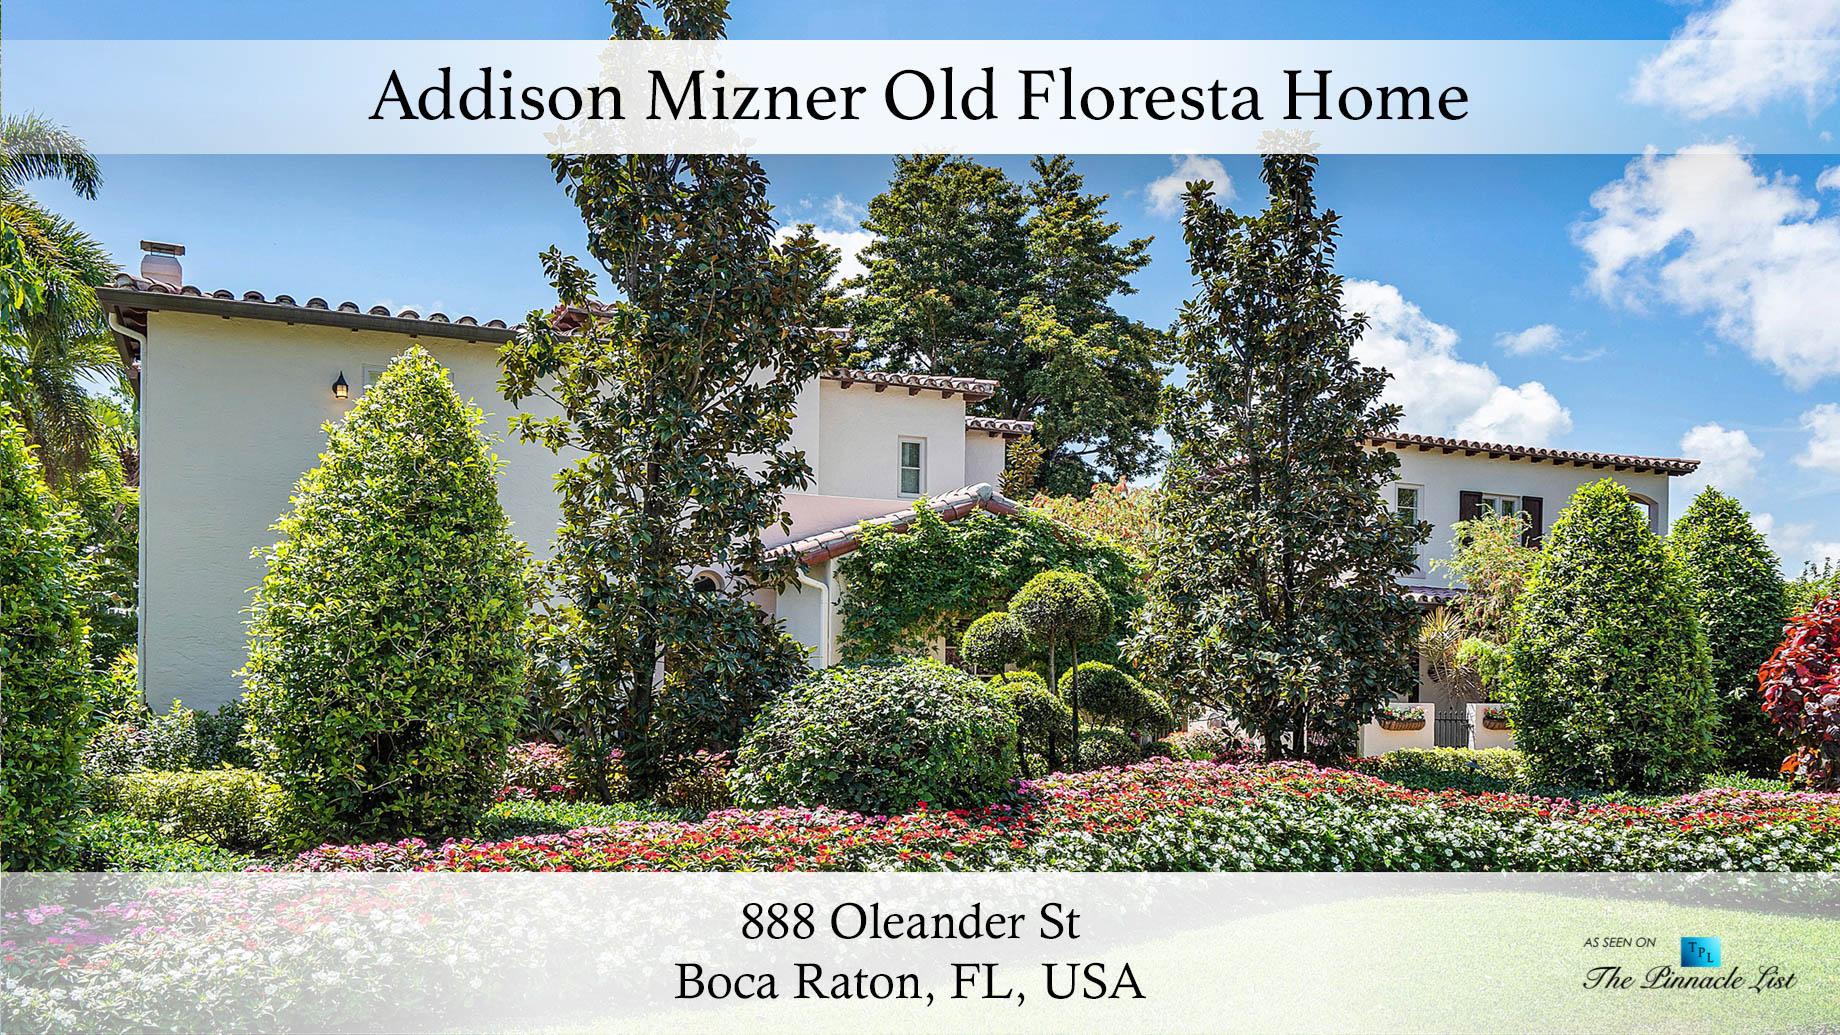 Addison Mizner Old Floresta Home – 888 Oleander St, Boca Raton, FL, USA